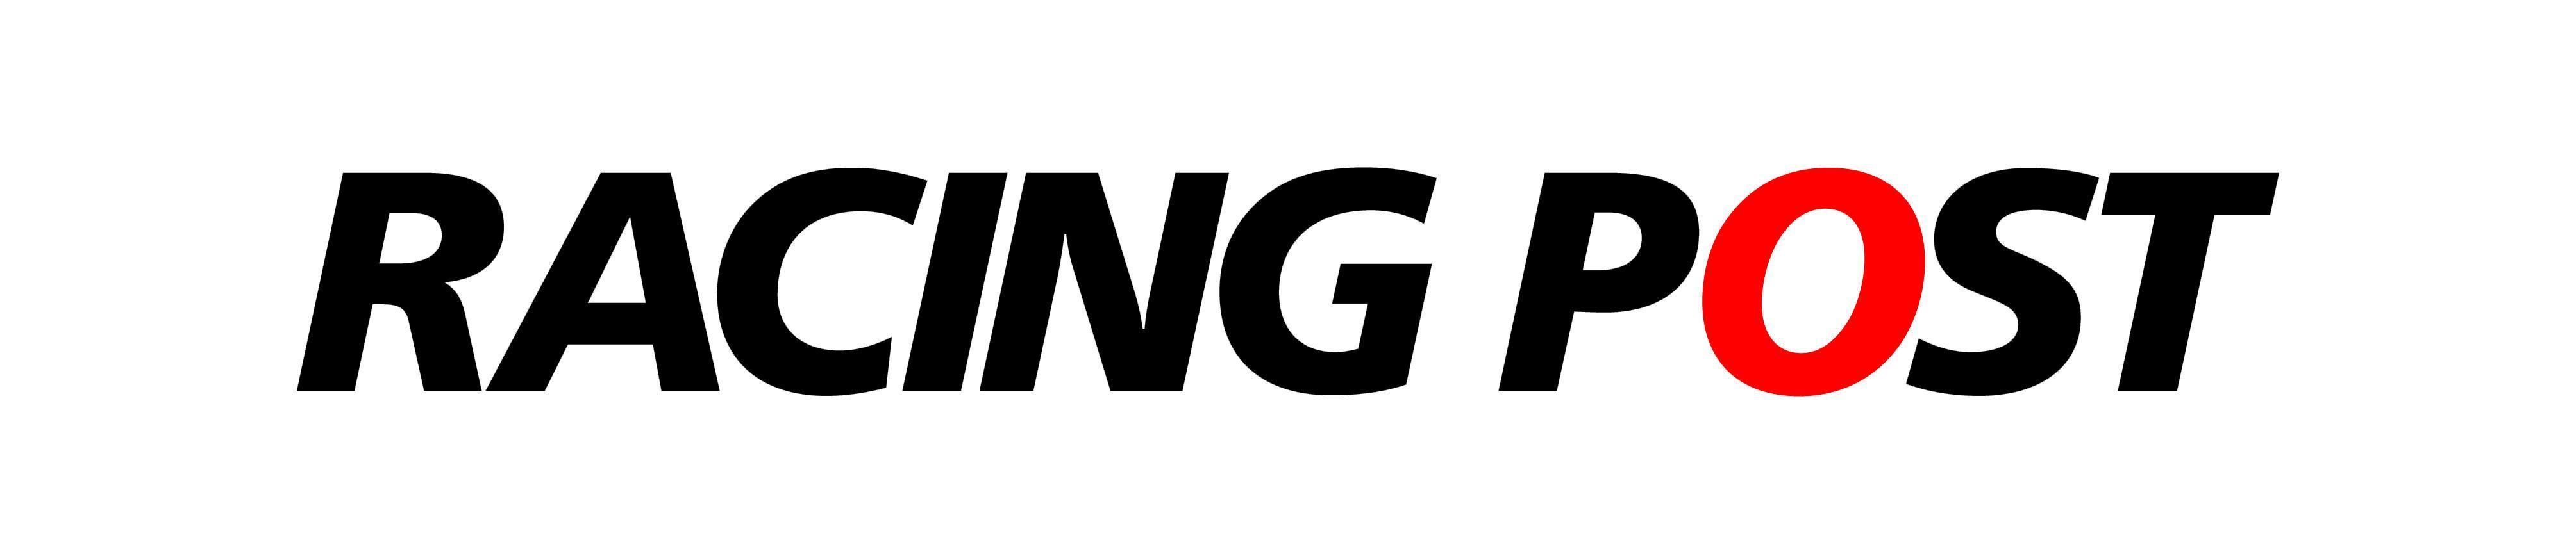 Racing Post company logo